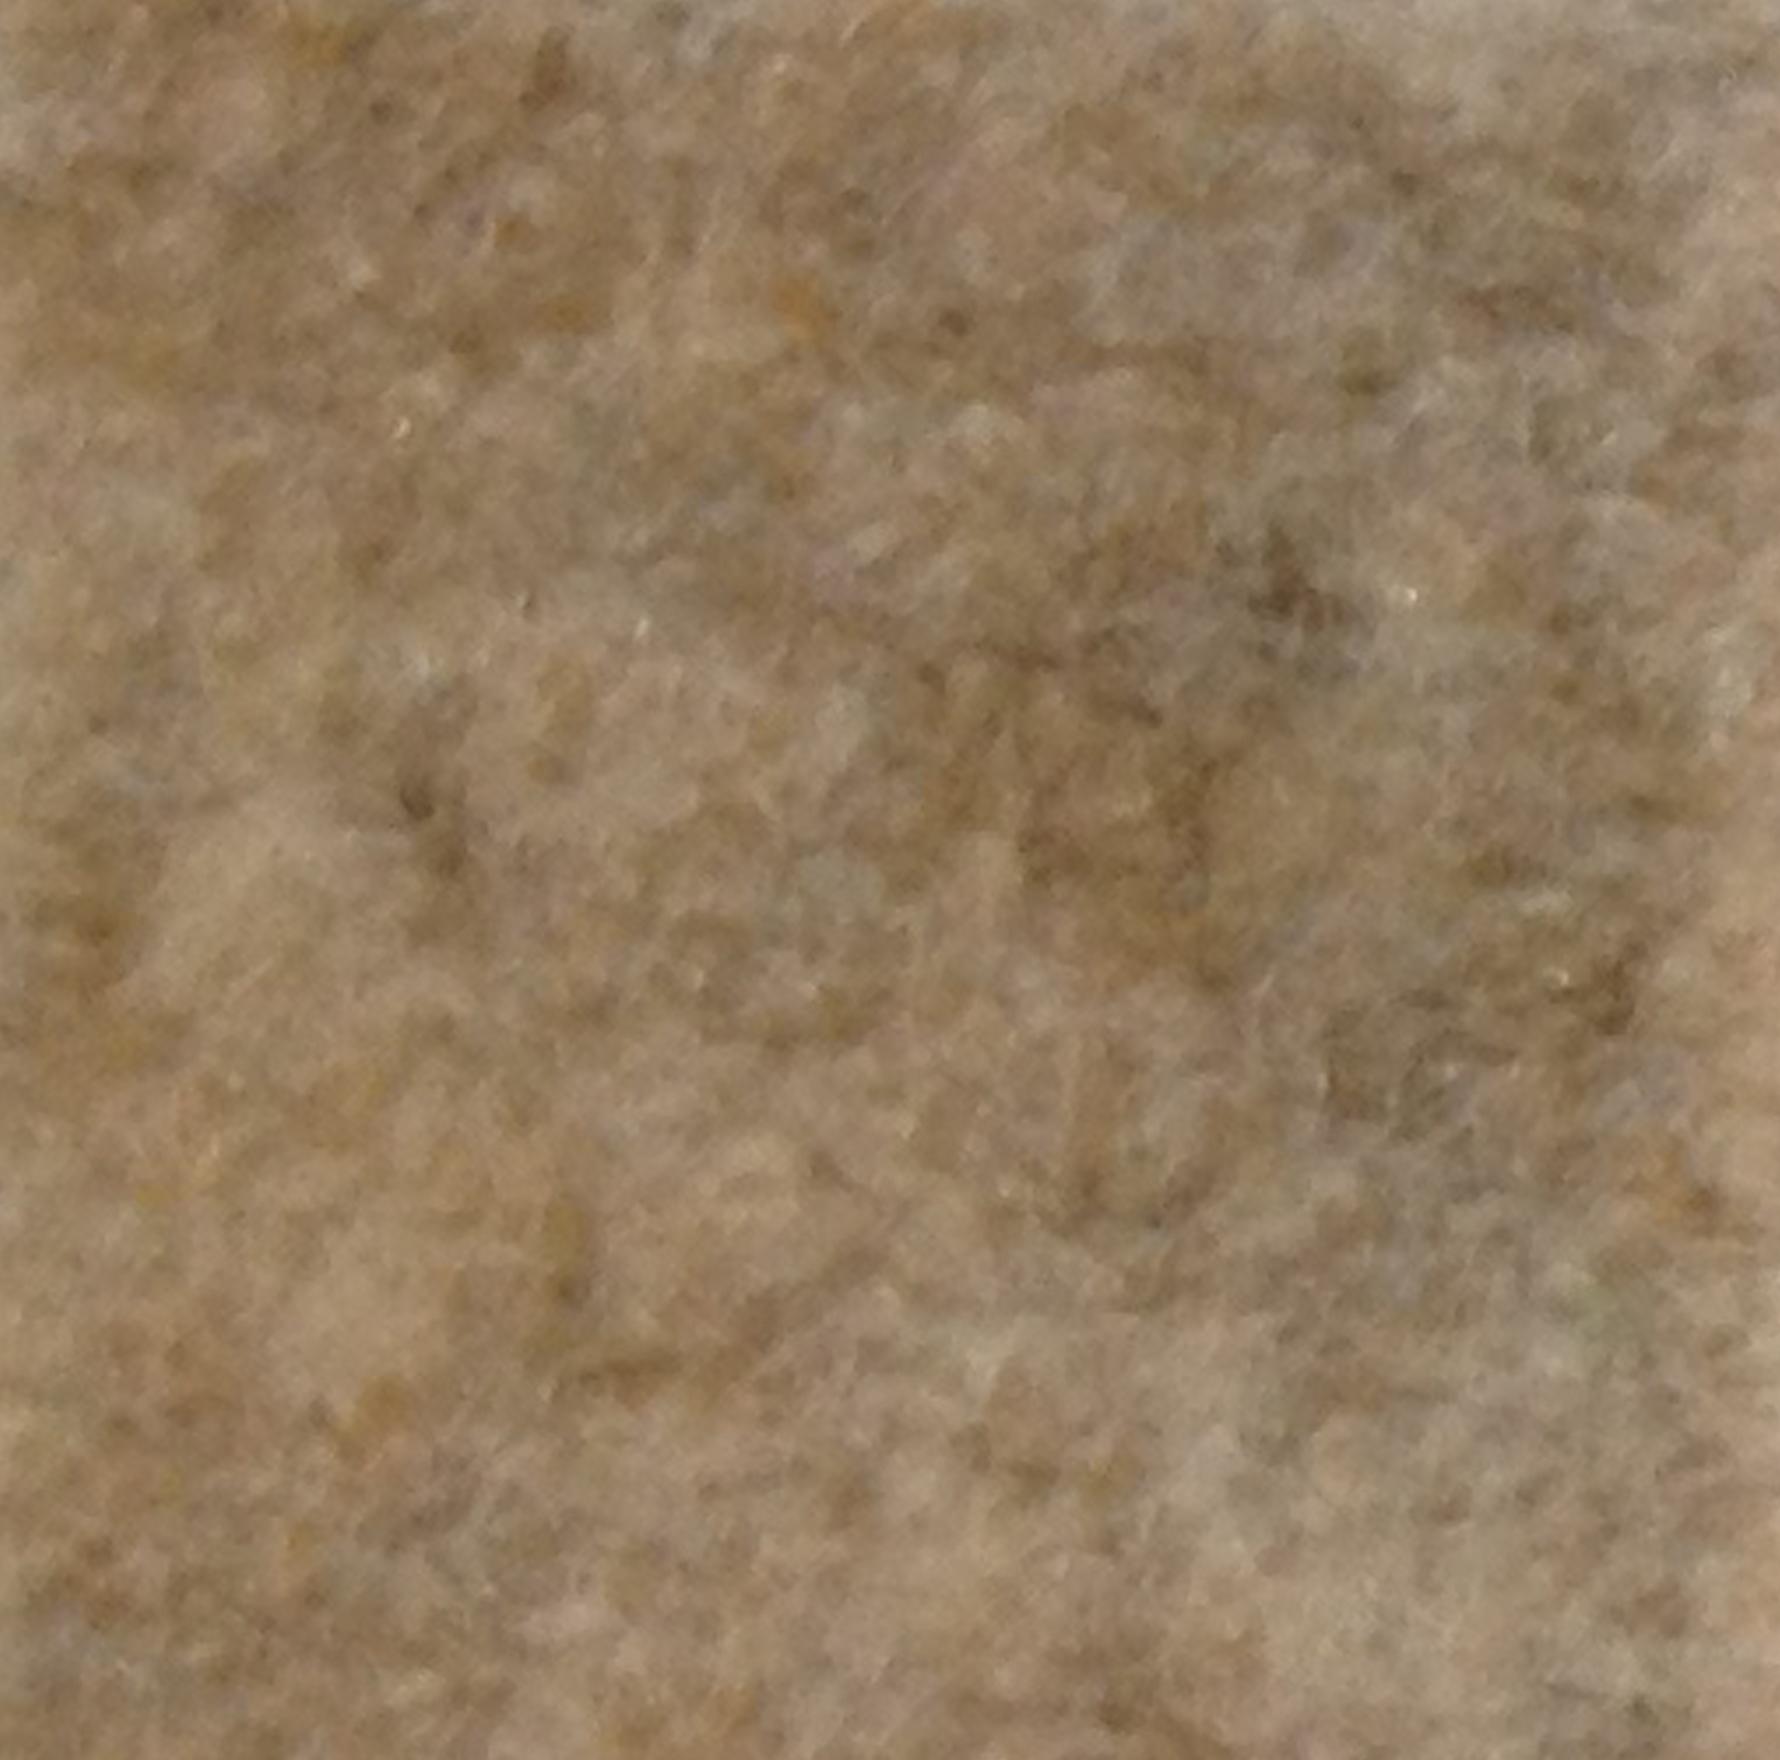 Solutions tech prod catalogue vente moquettes eco moq moquette beige chin materiel for Moquette ignifugee